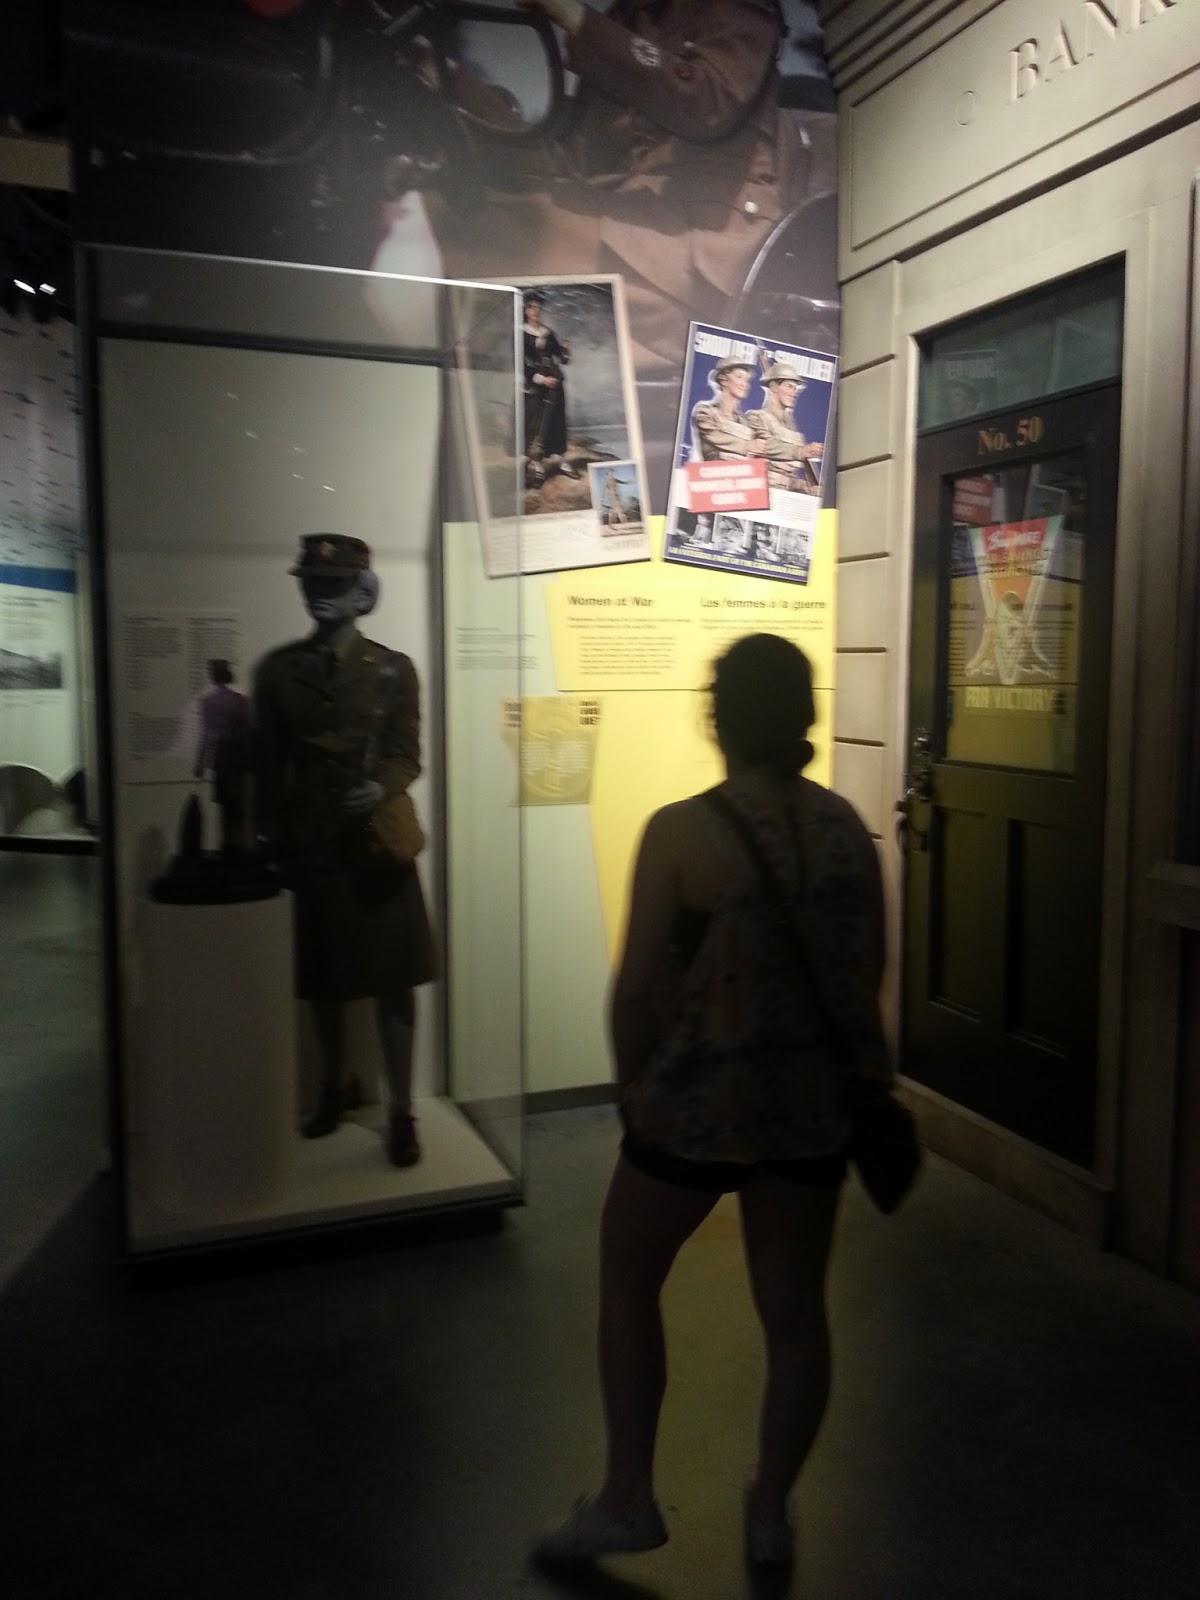 Strip hanging museum art